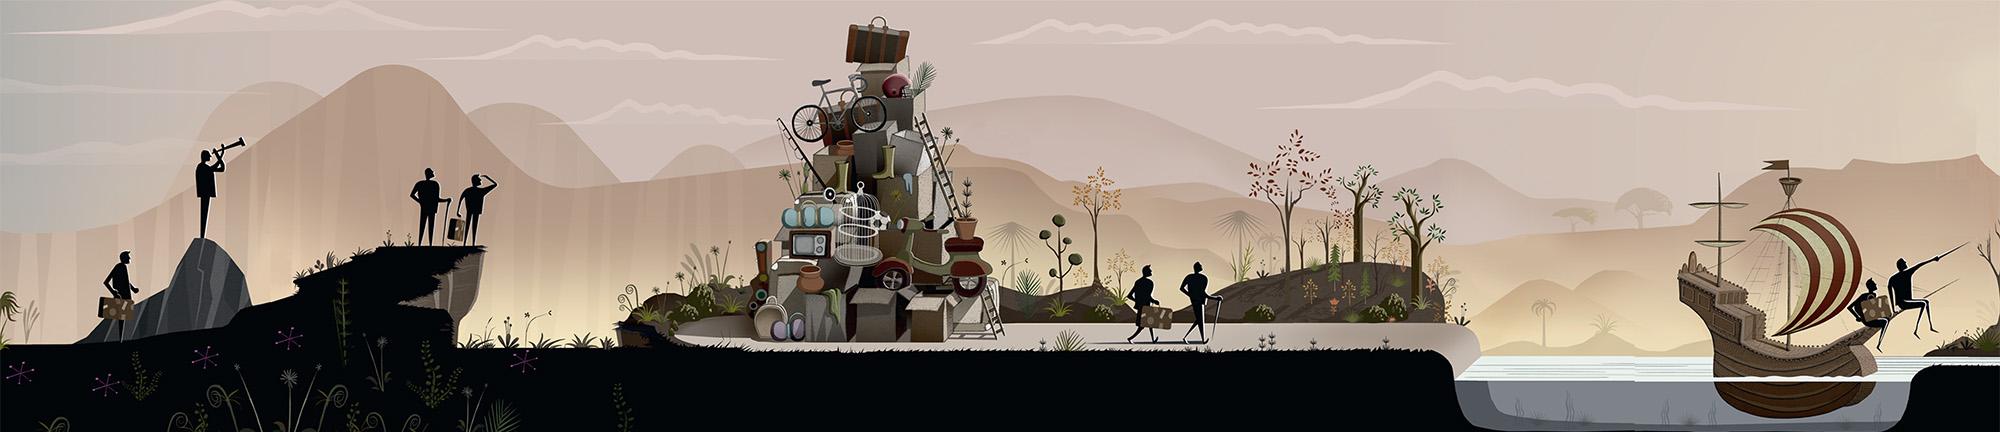 Punter Southall journey illustration 1